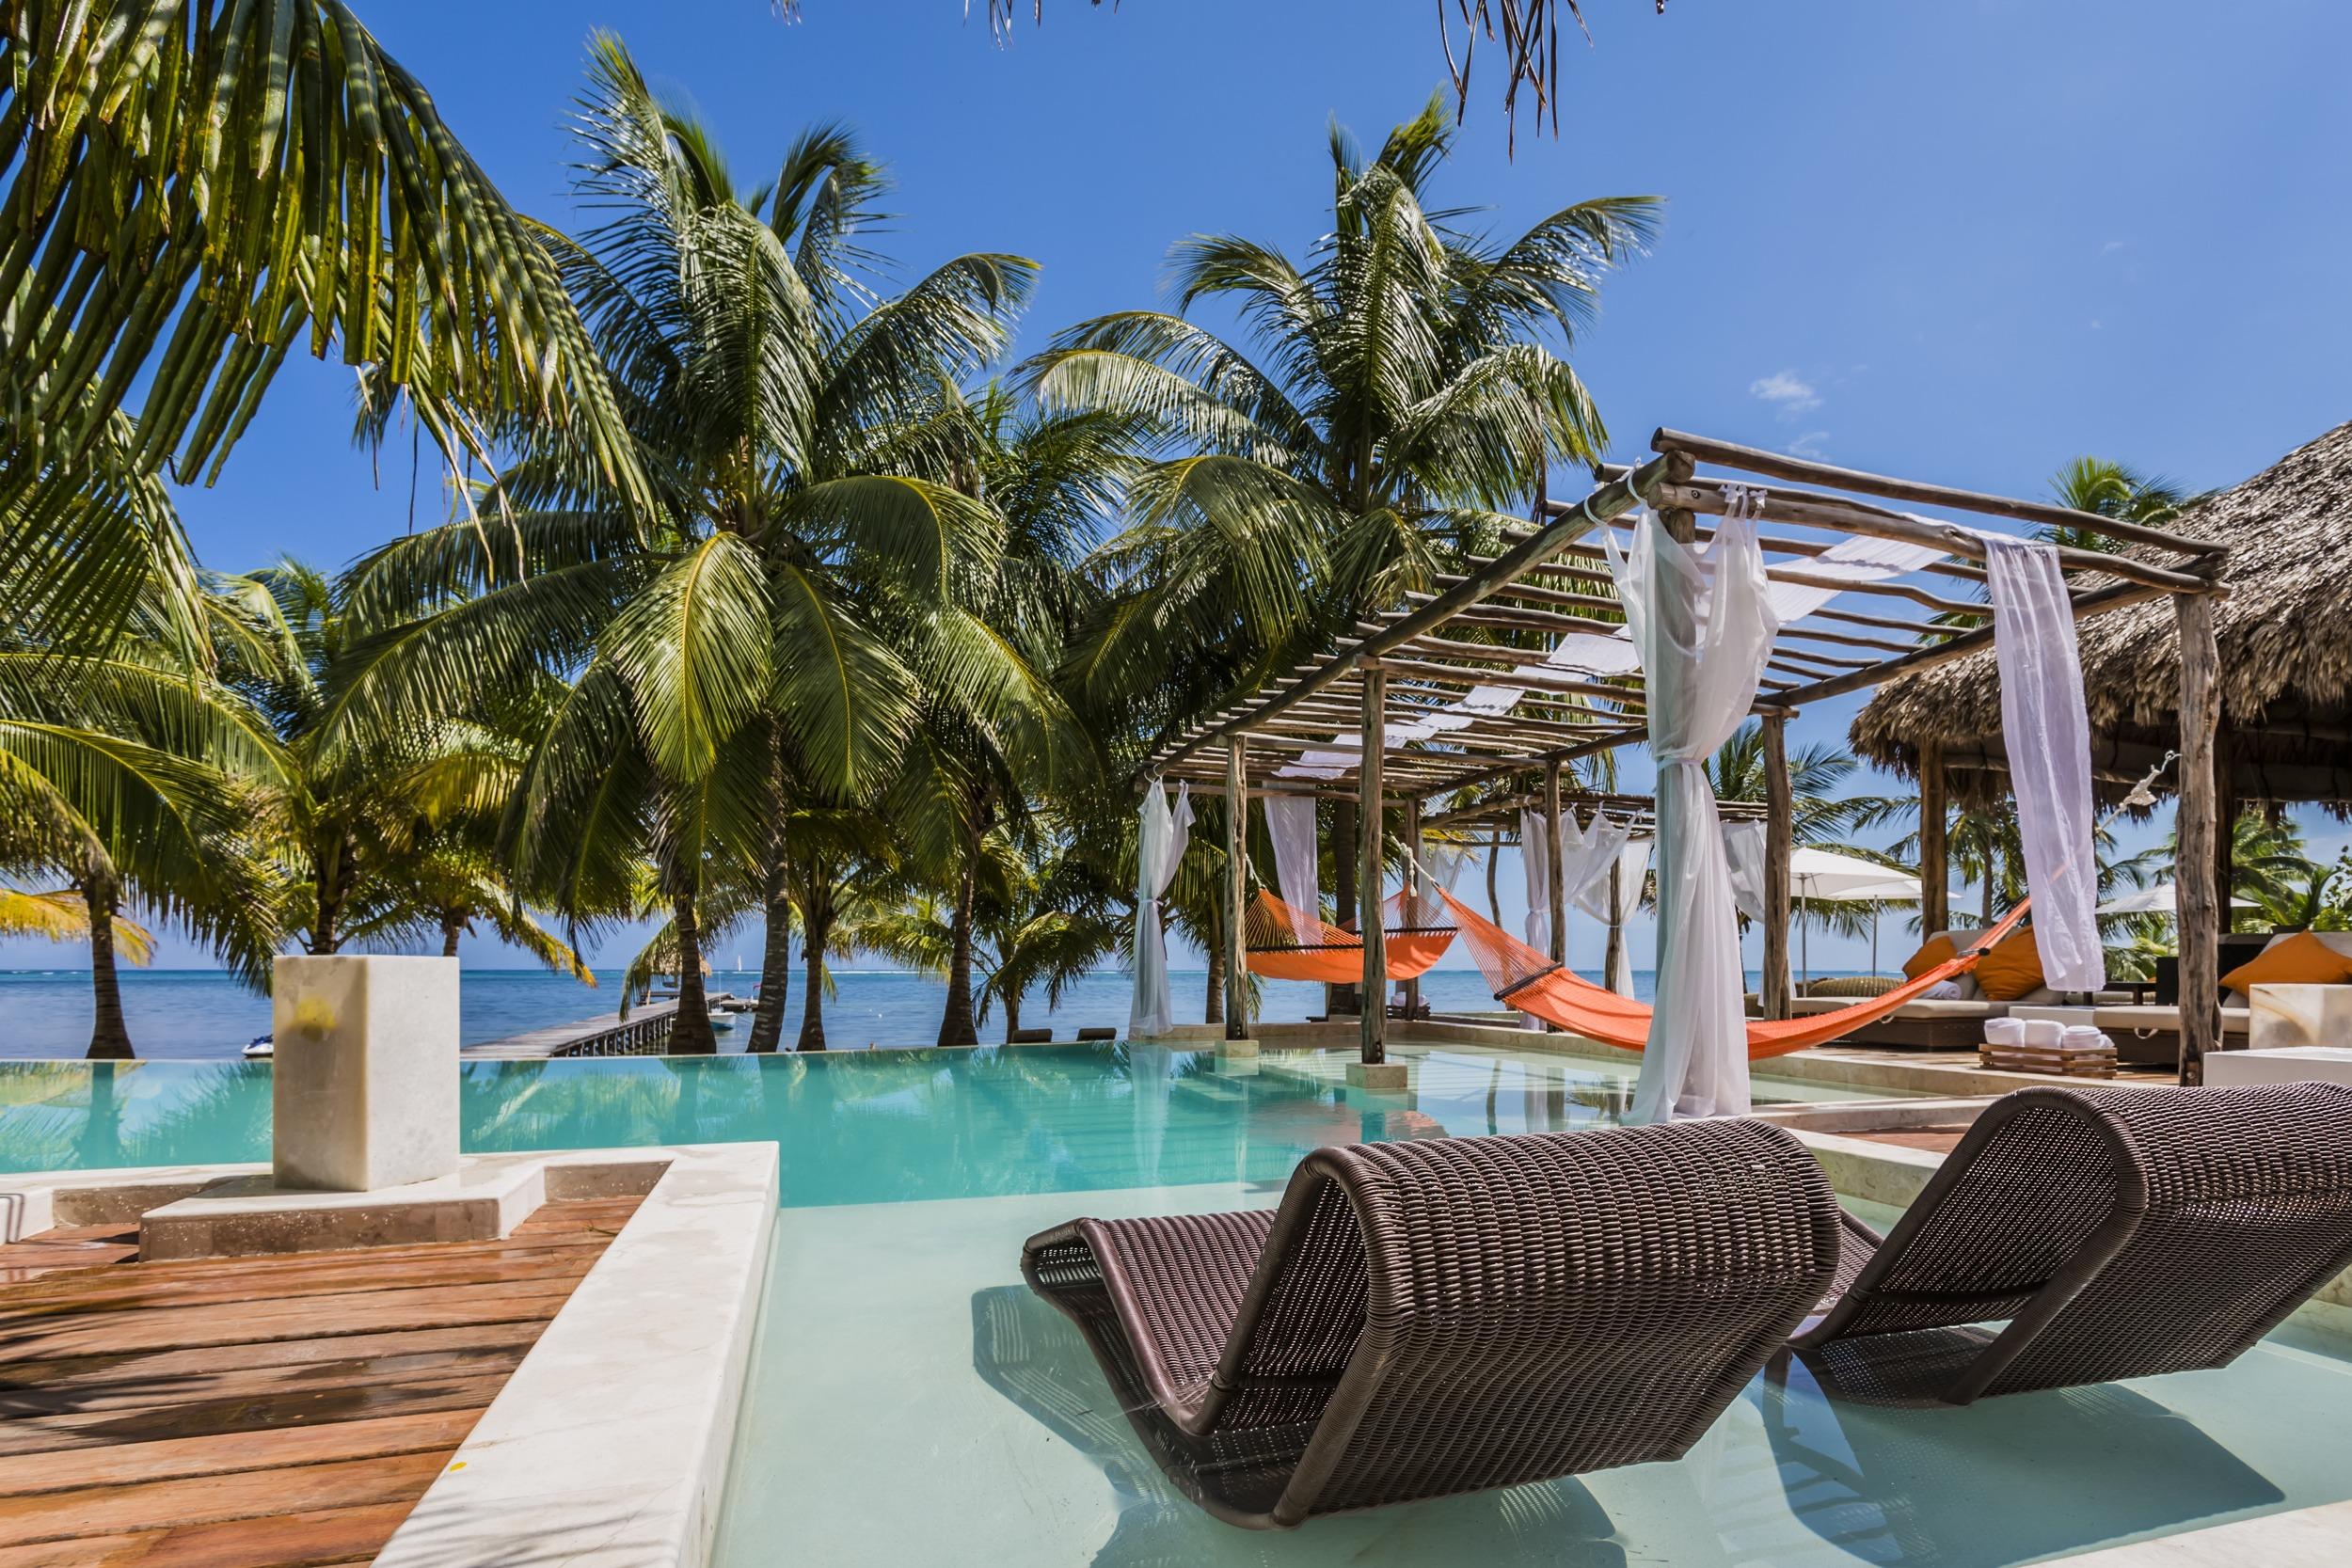 Belize Resorts: Top 36 Resorts In Belize